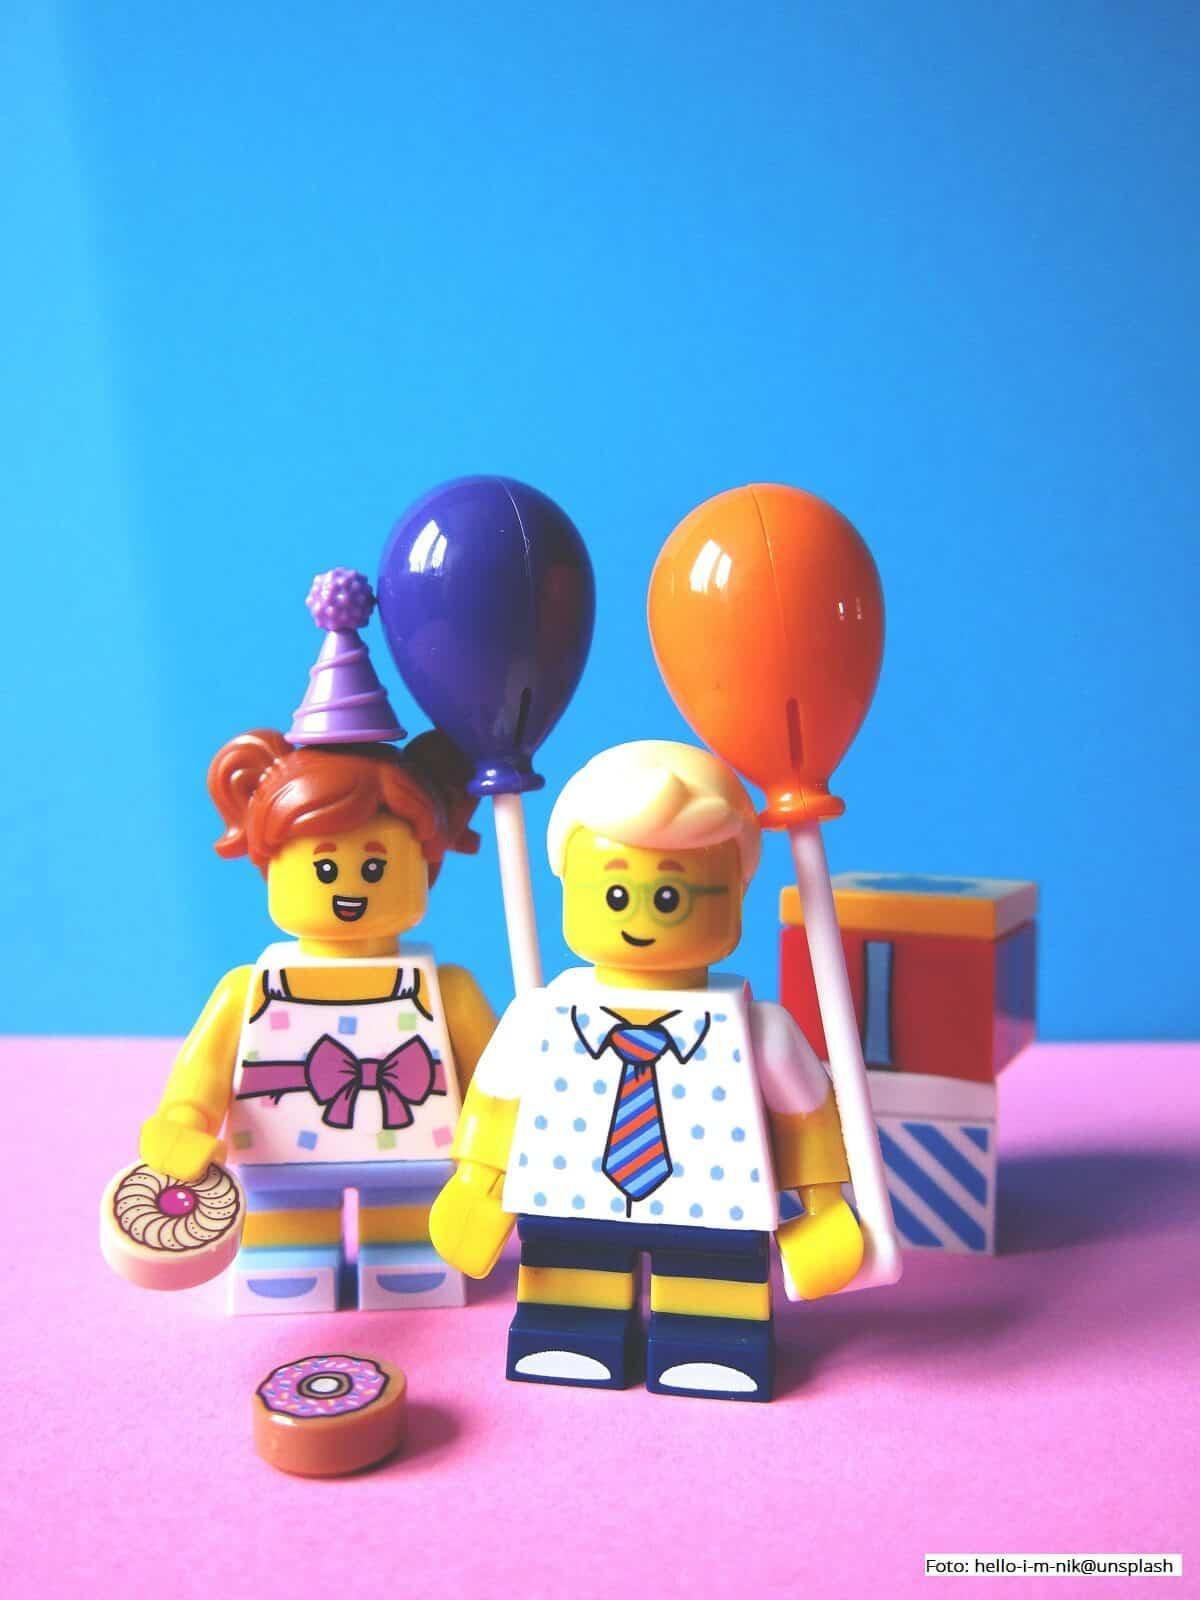 Vorteile Lego Serious Play